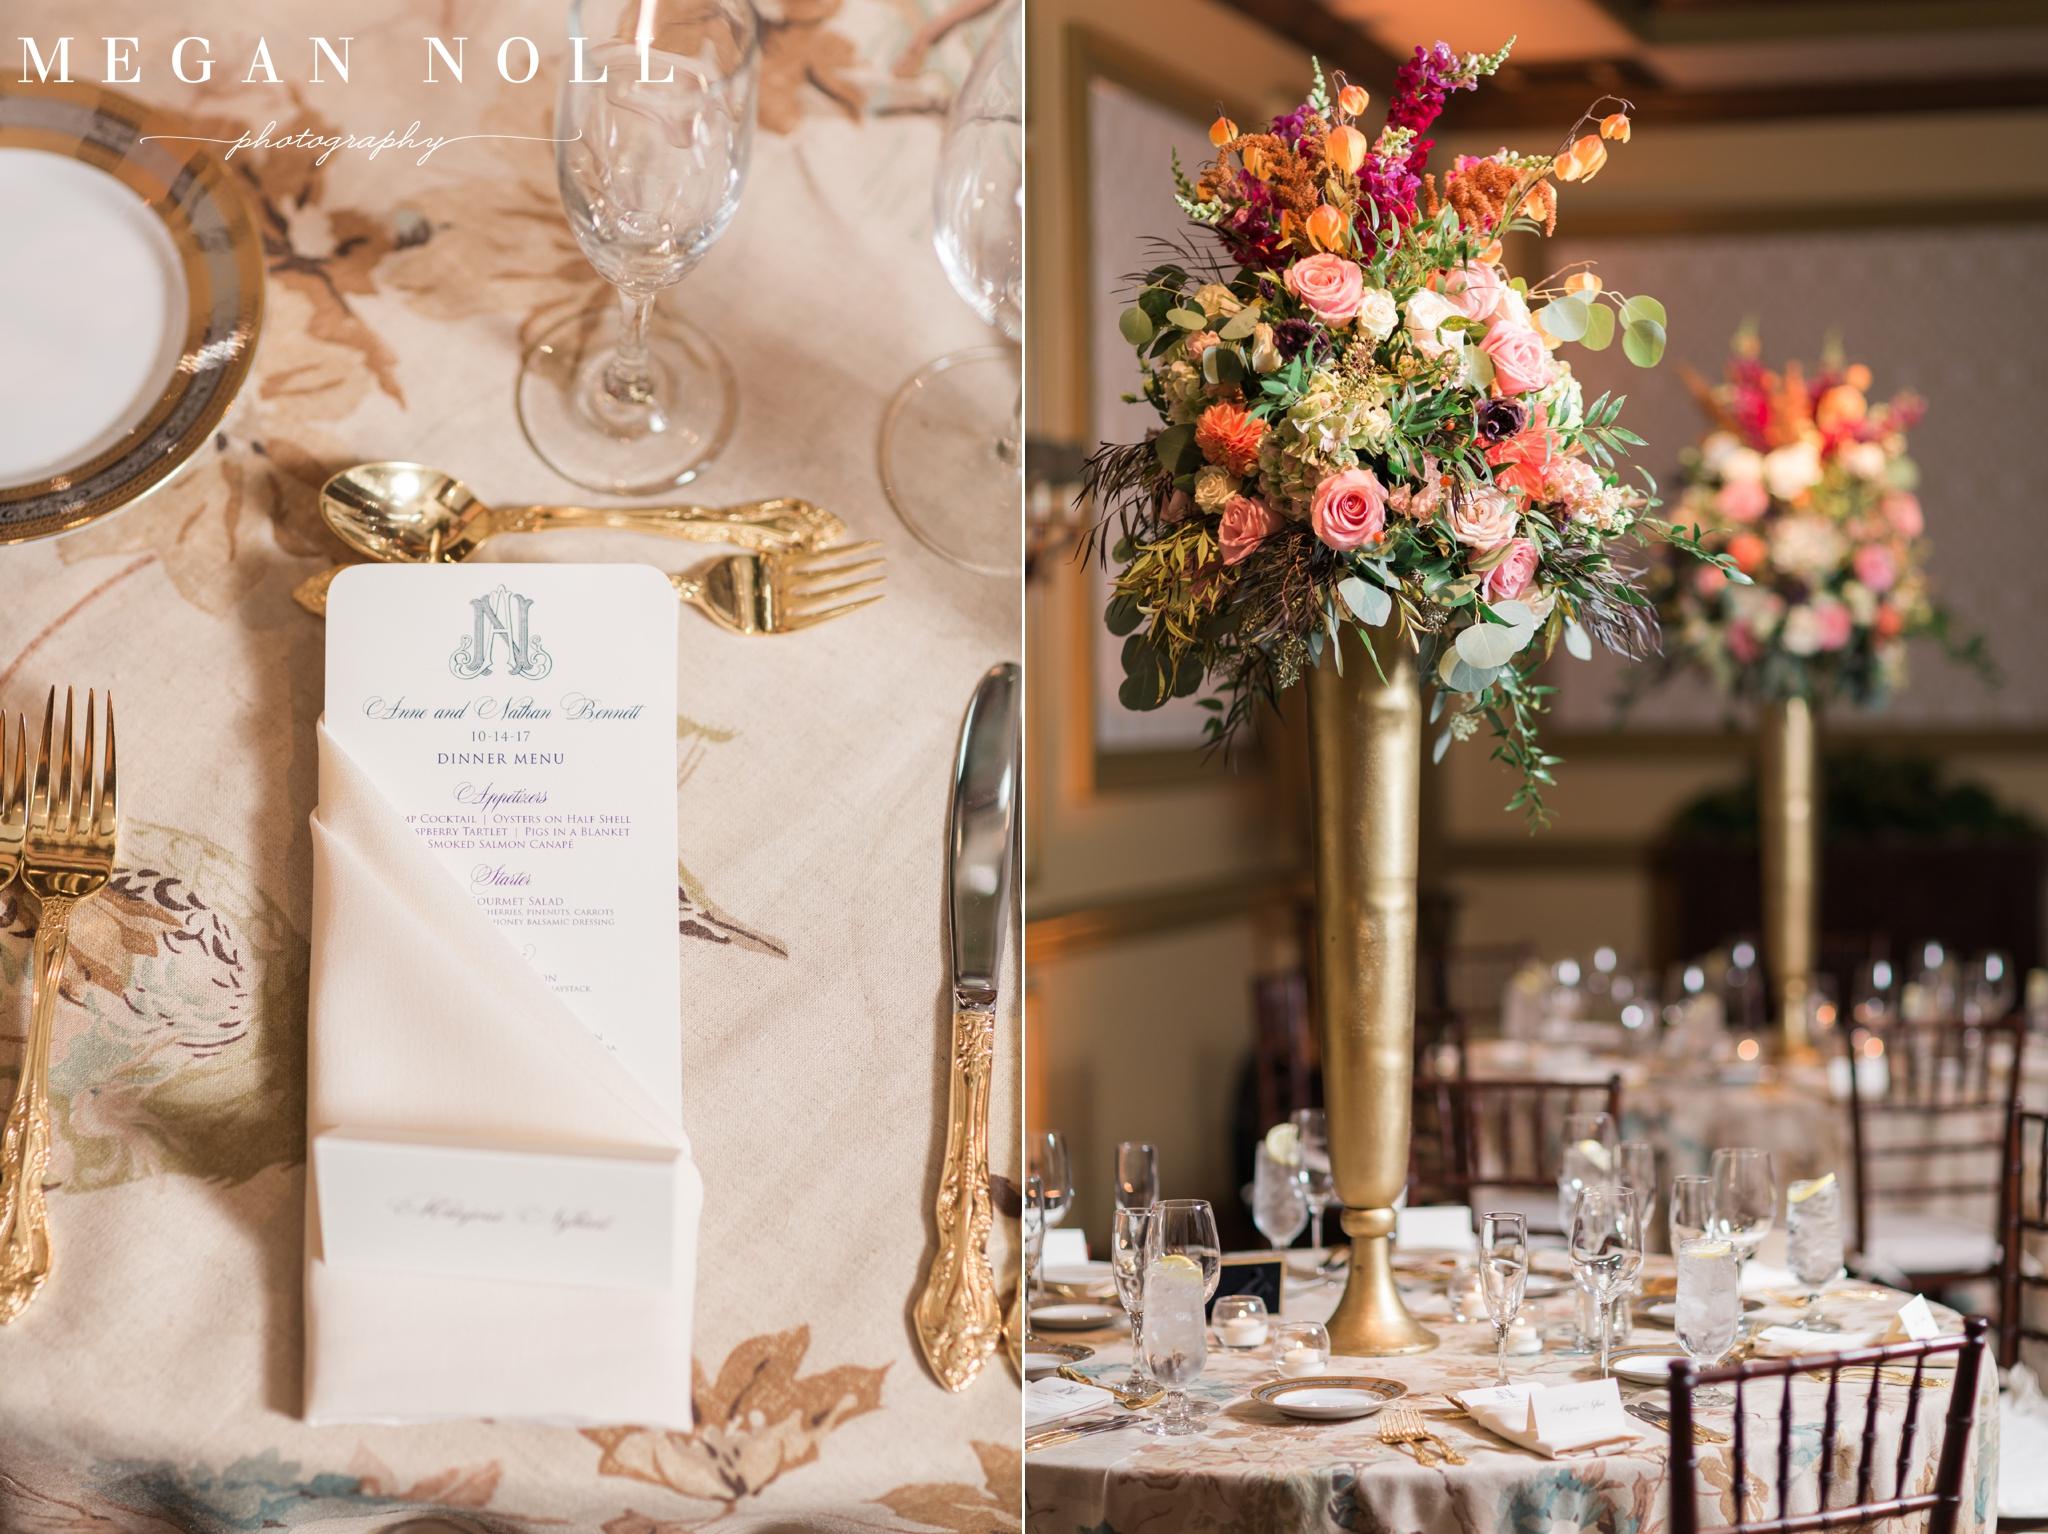 Kenwood Country Club, Centerpieces, Marti Heard, Fall Wedding